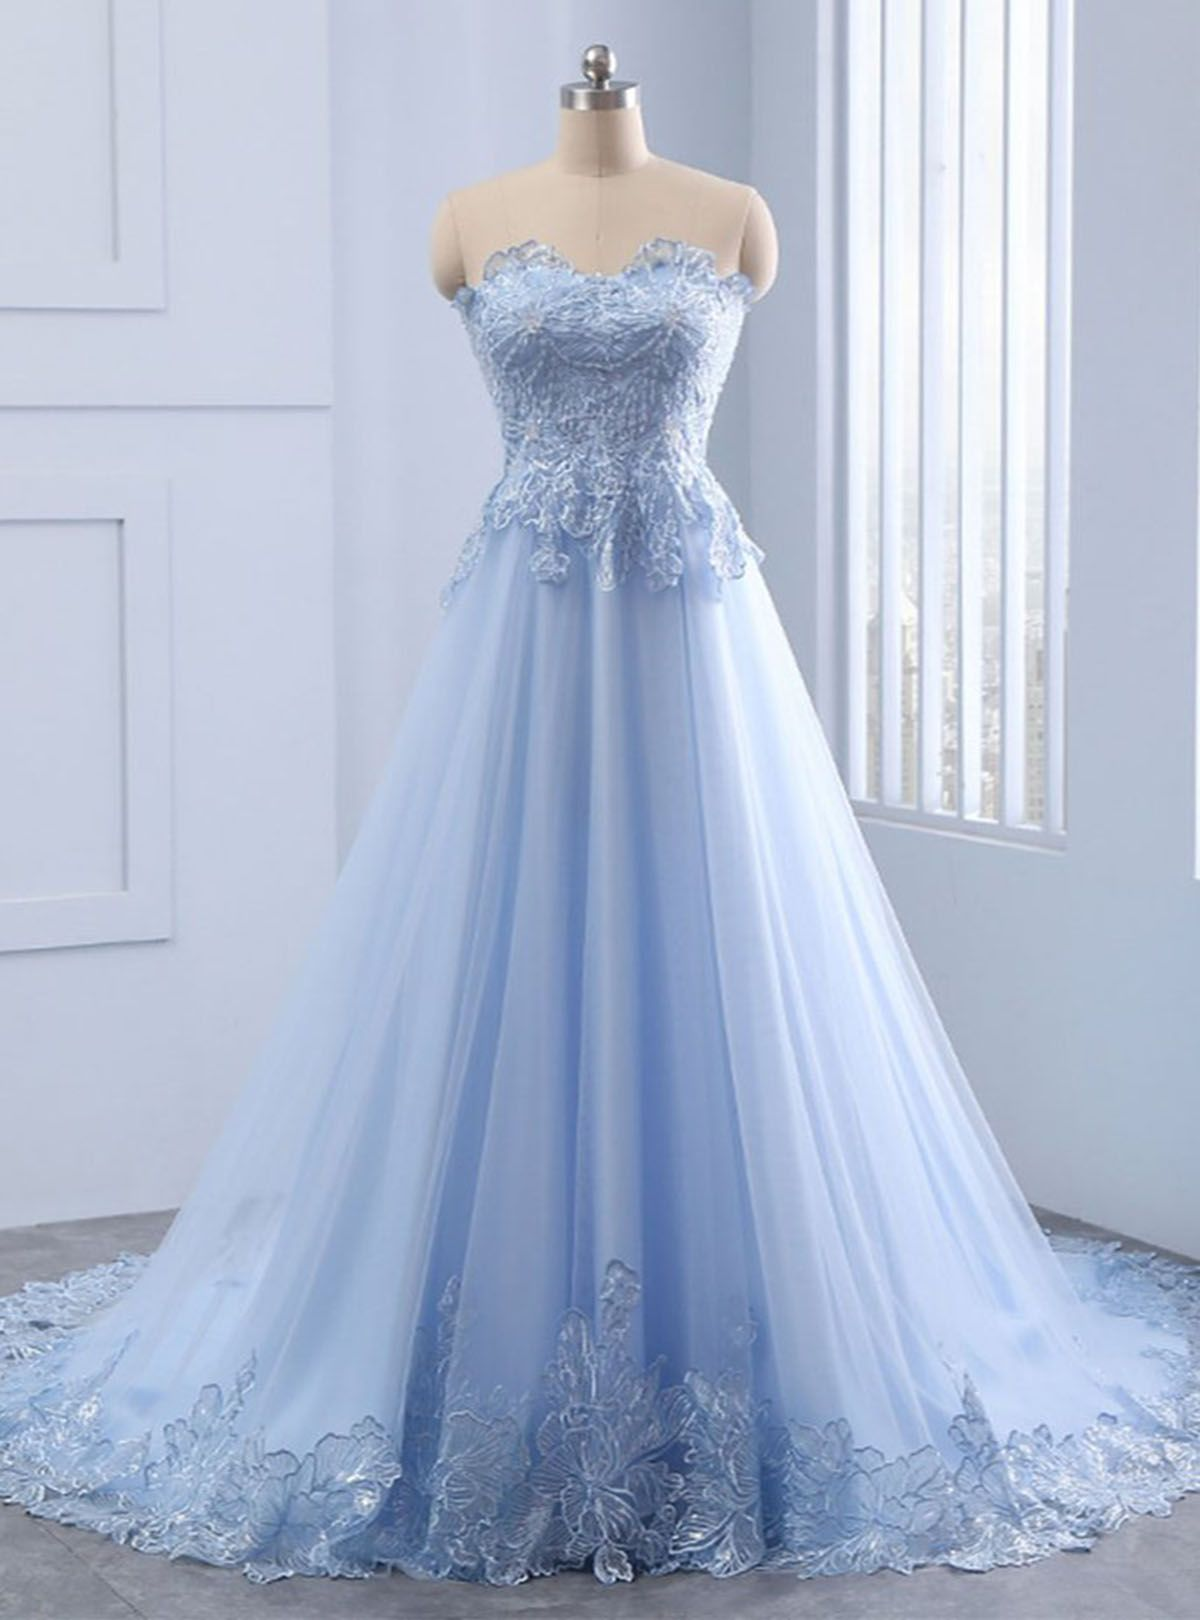 Sweetheart neck blue lace A line long graduation dress, blue